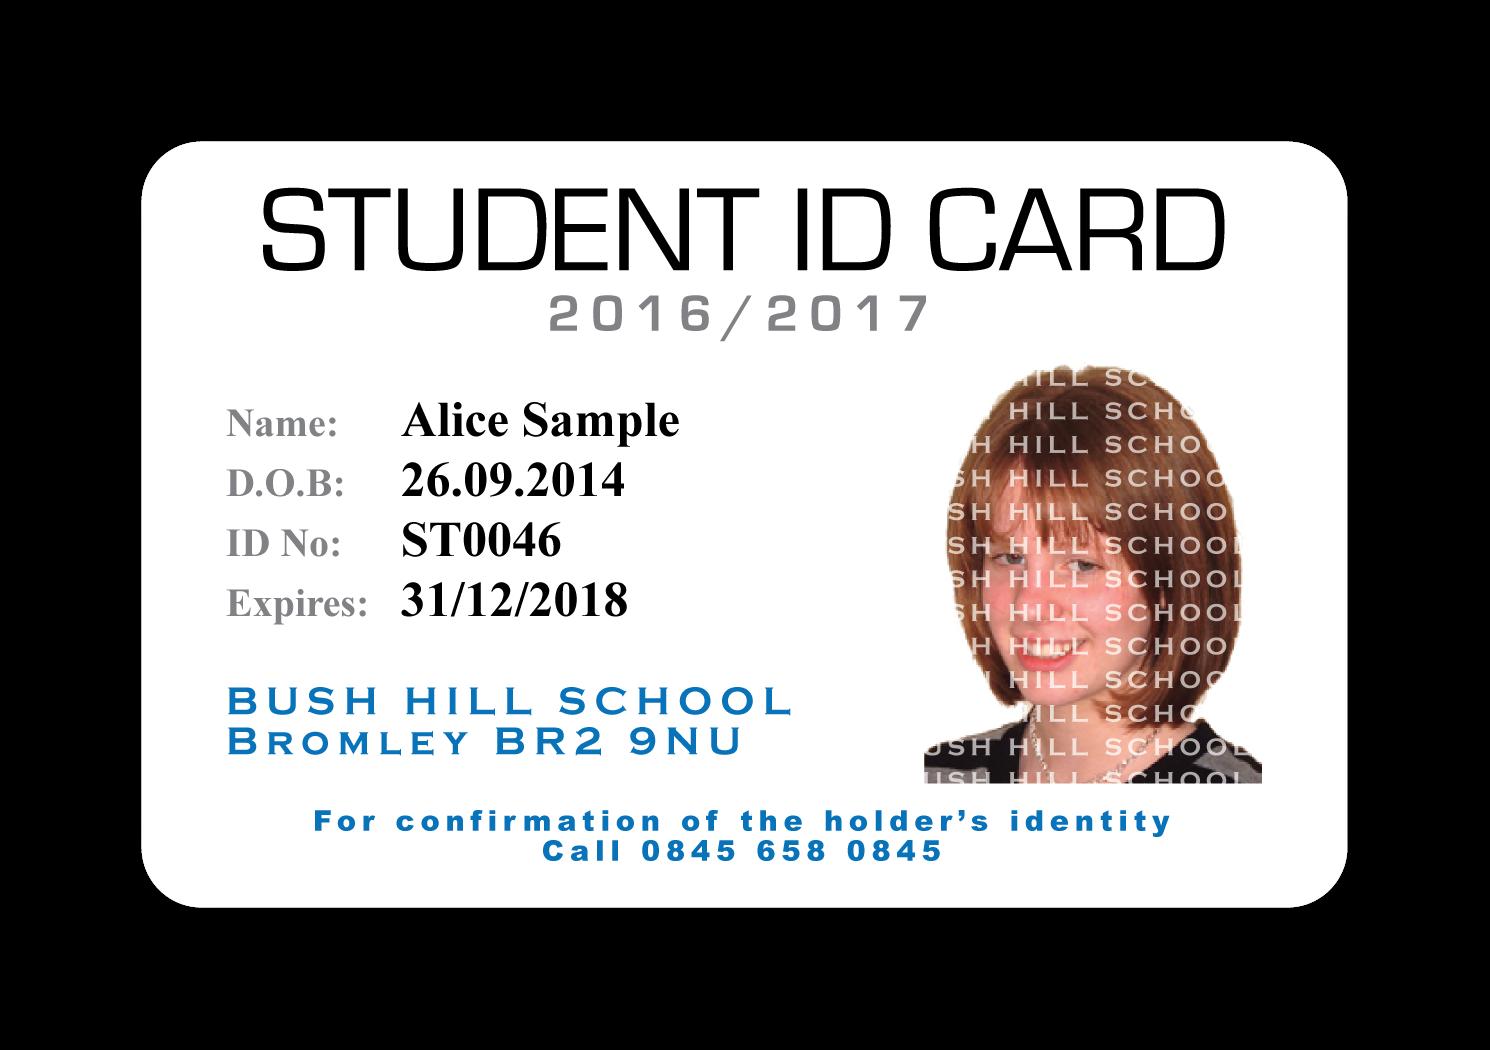 Student ID Card